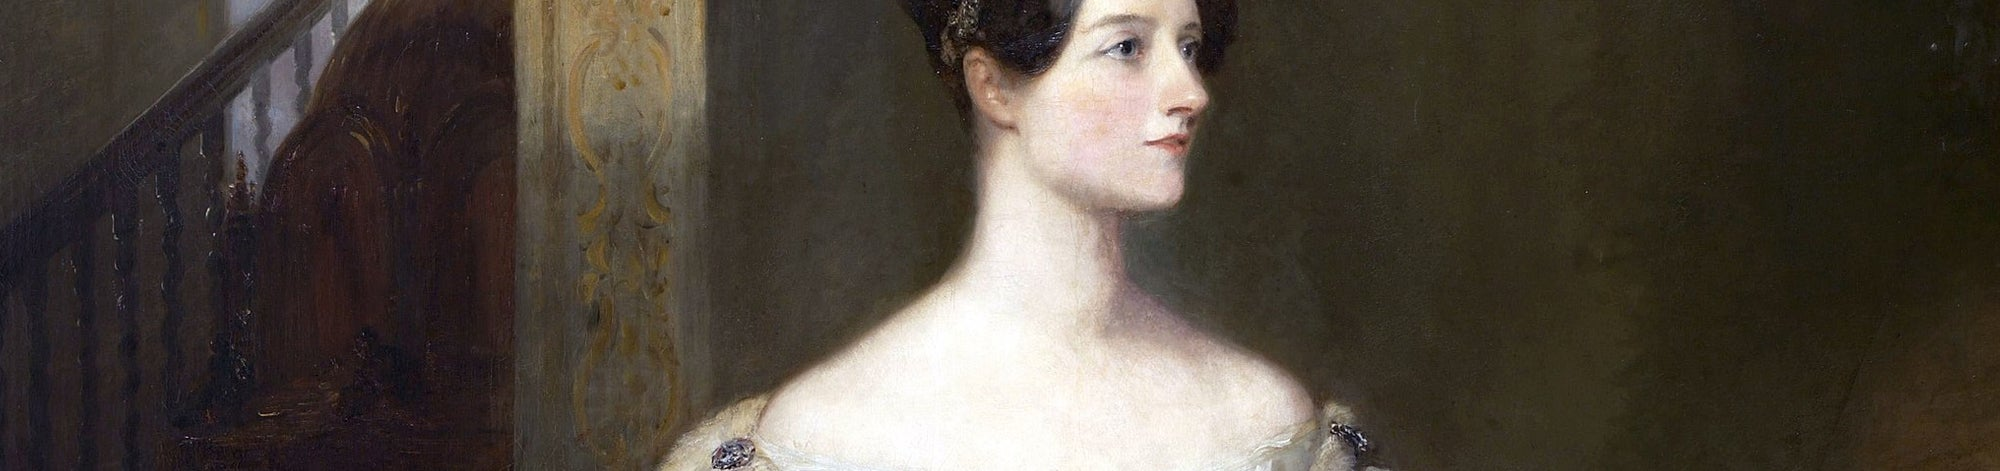 Ada Lovelace - painting crop